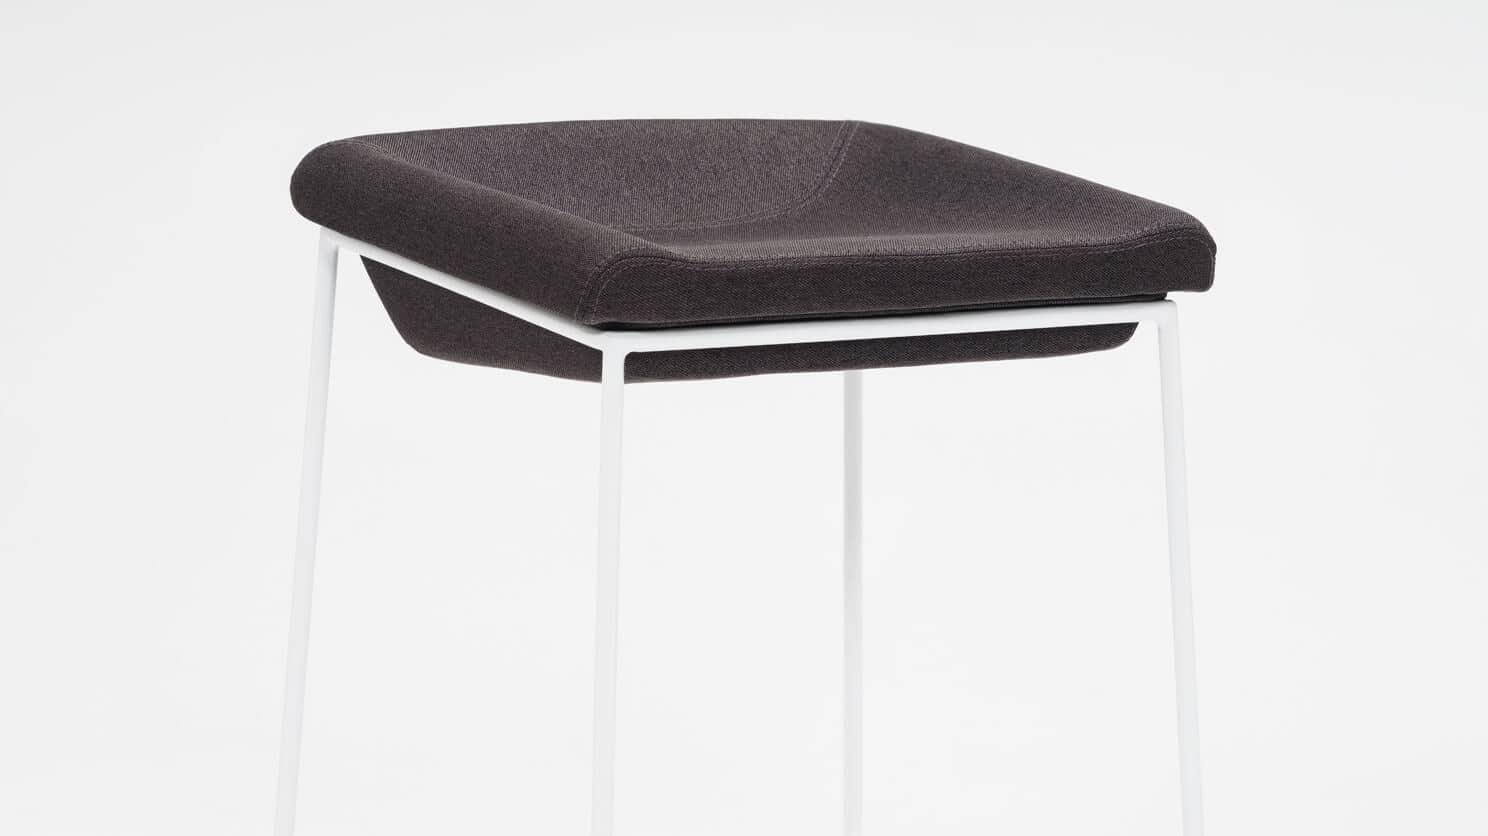 3020 266 par 2 counter chairs mackenzie bar stool dark grey seat white base detail 01 1